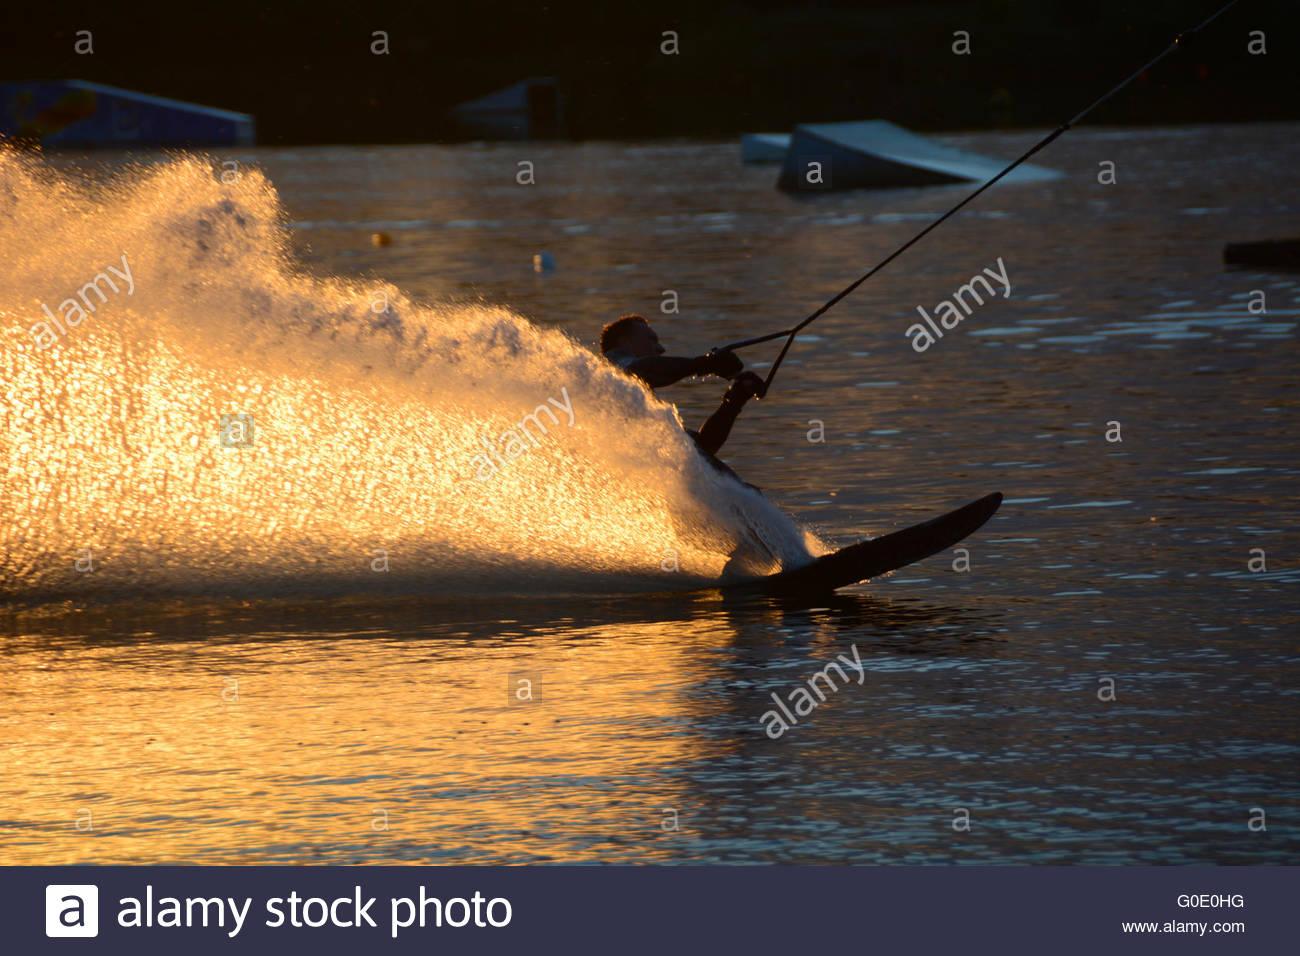 wakeboarding - Stock Image